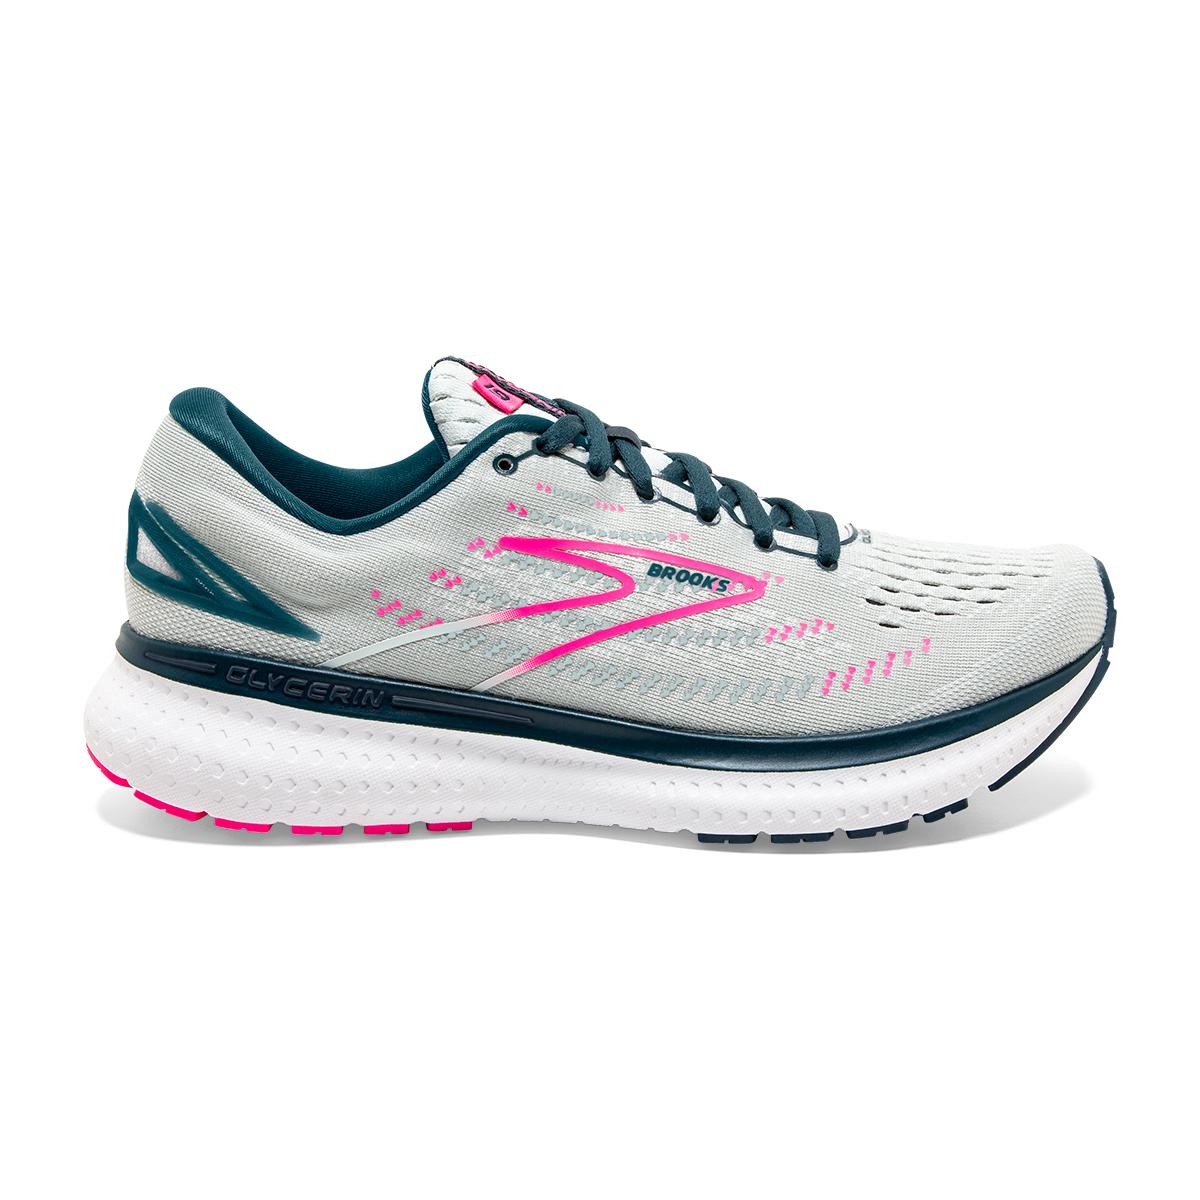 Women's Brooks Glycerin 19 Running Shoe - Color: Ice Flow/Navy - Size: 5 - Width: Regular, Ice Flow/Navy, large, image 1